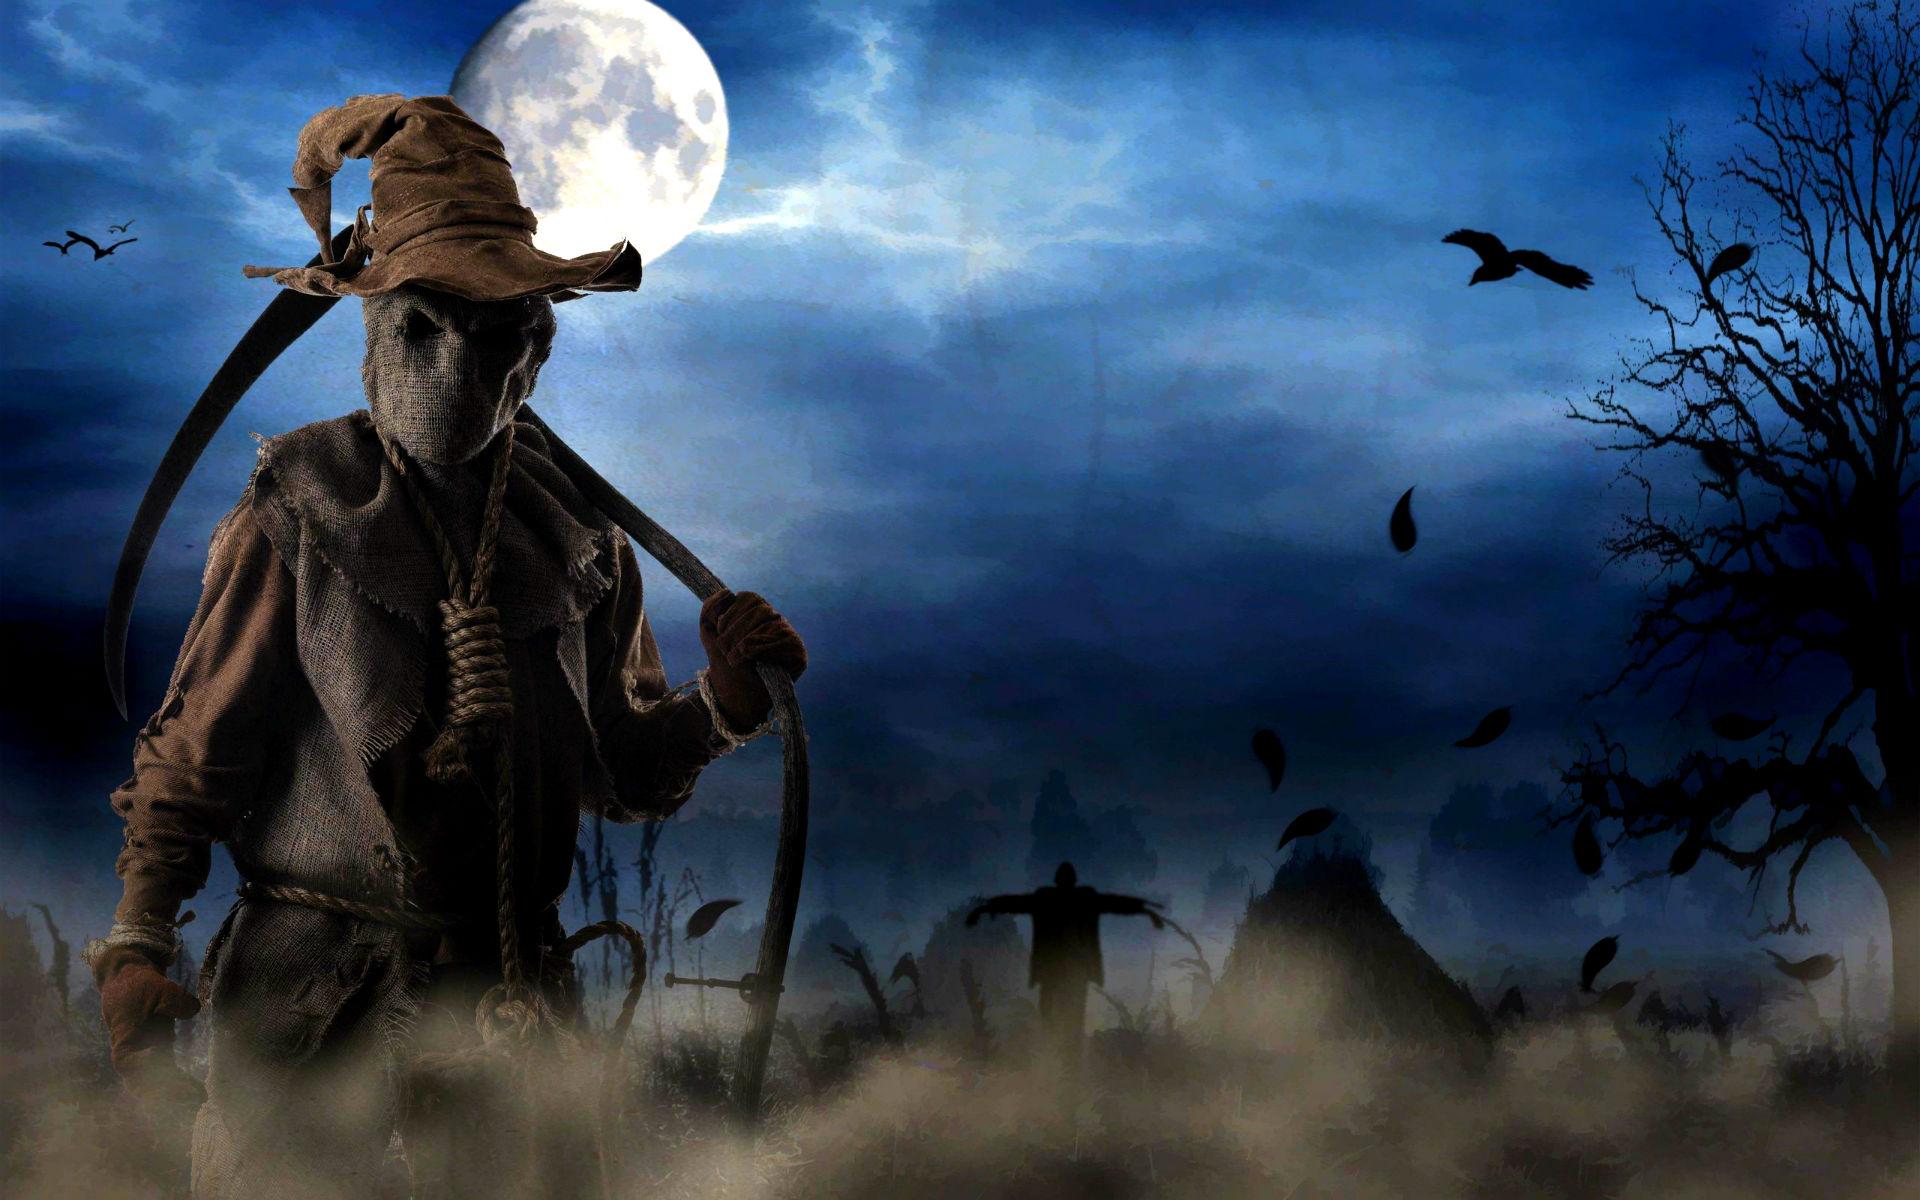 Halloween Wallpaper Download Scary Hd   Wallpapers Mela 1920x1200